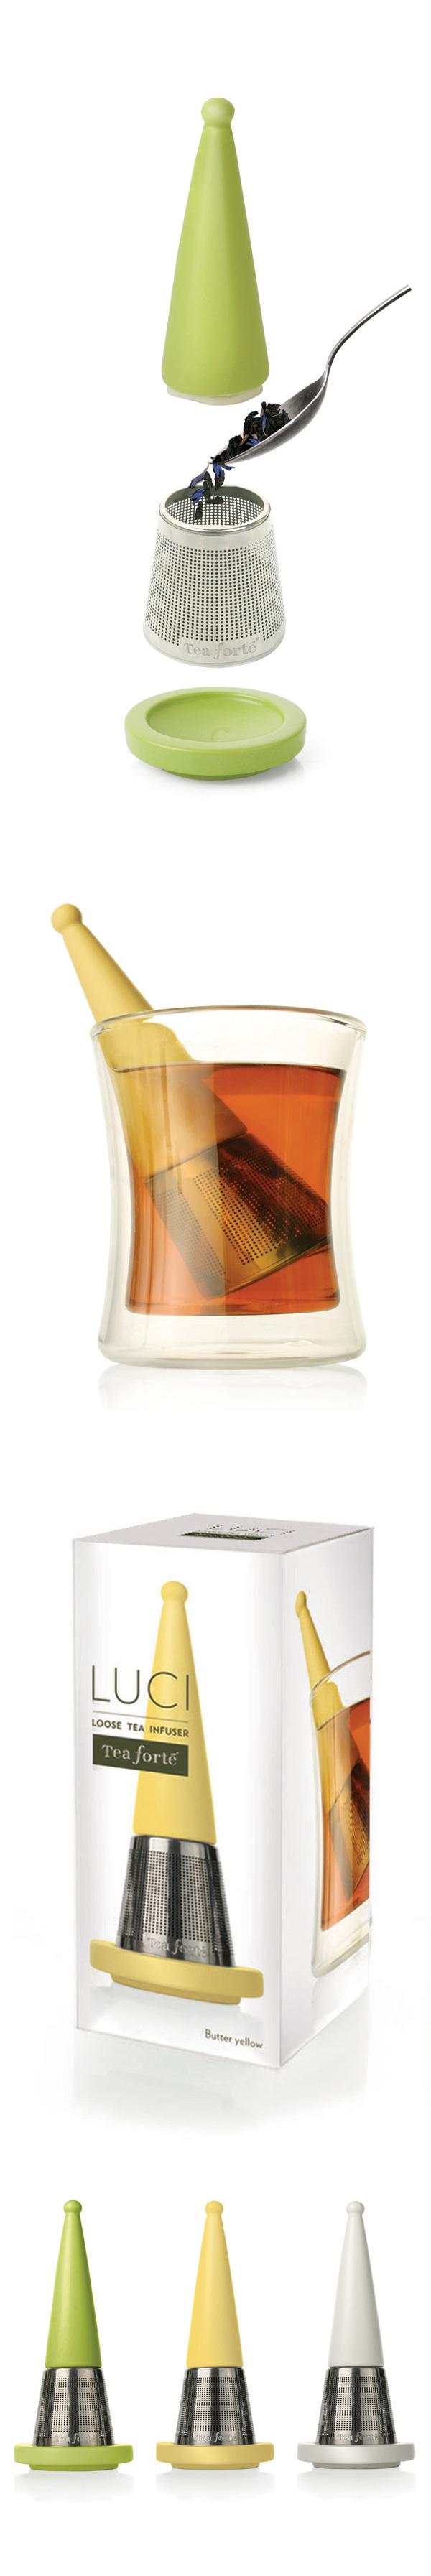 Tea Forte 露思錐形茶葉濾器(鵝黃)